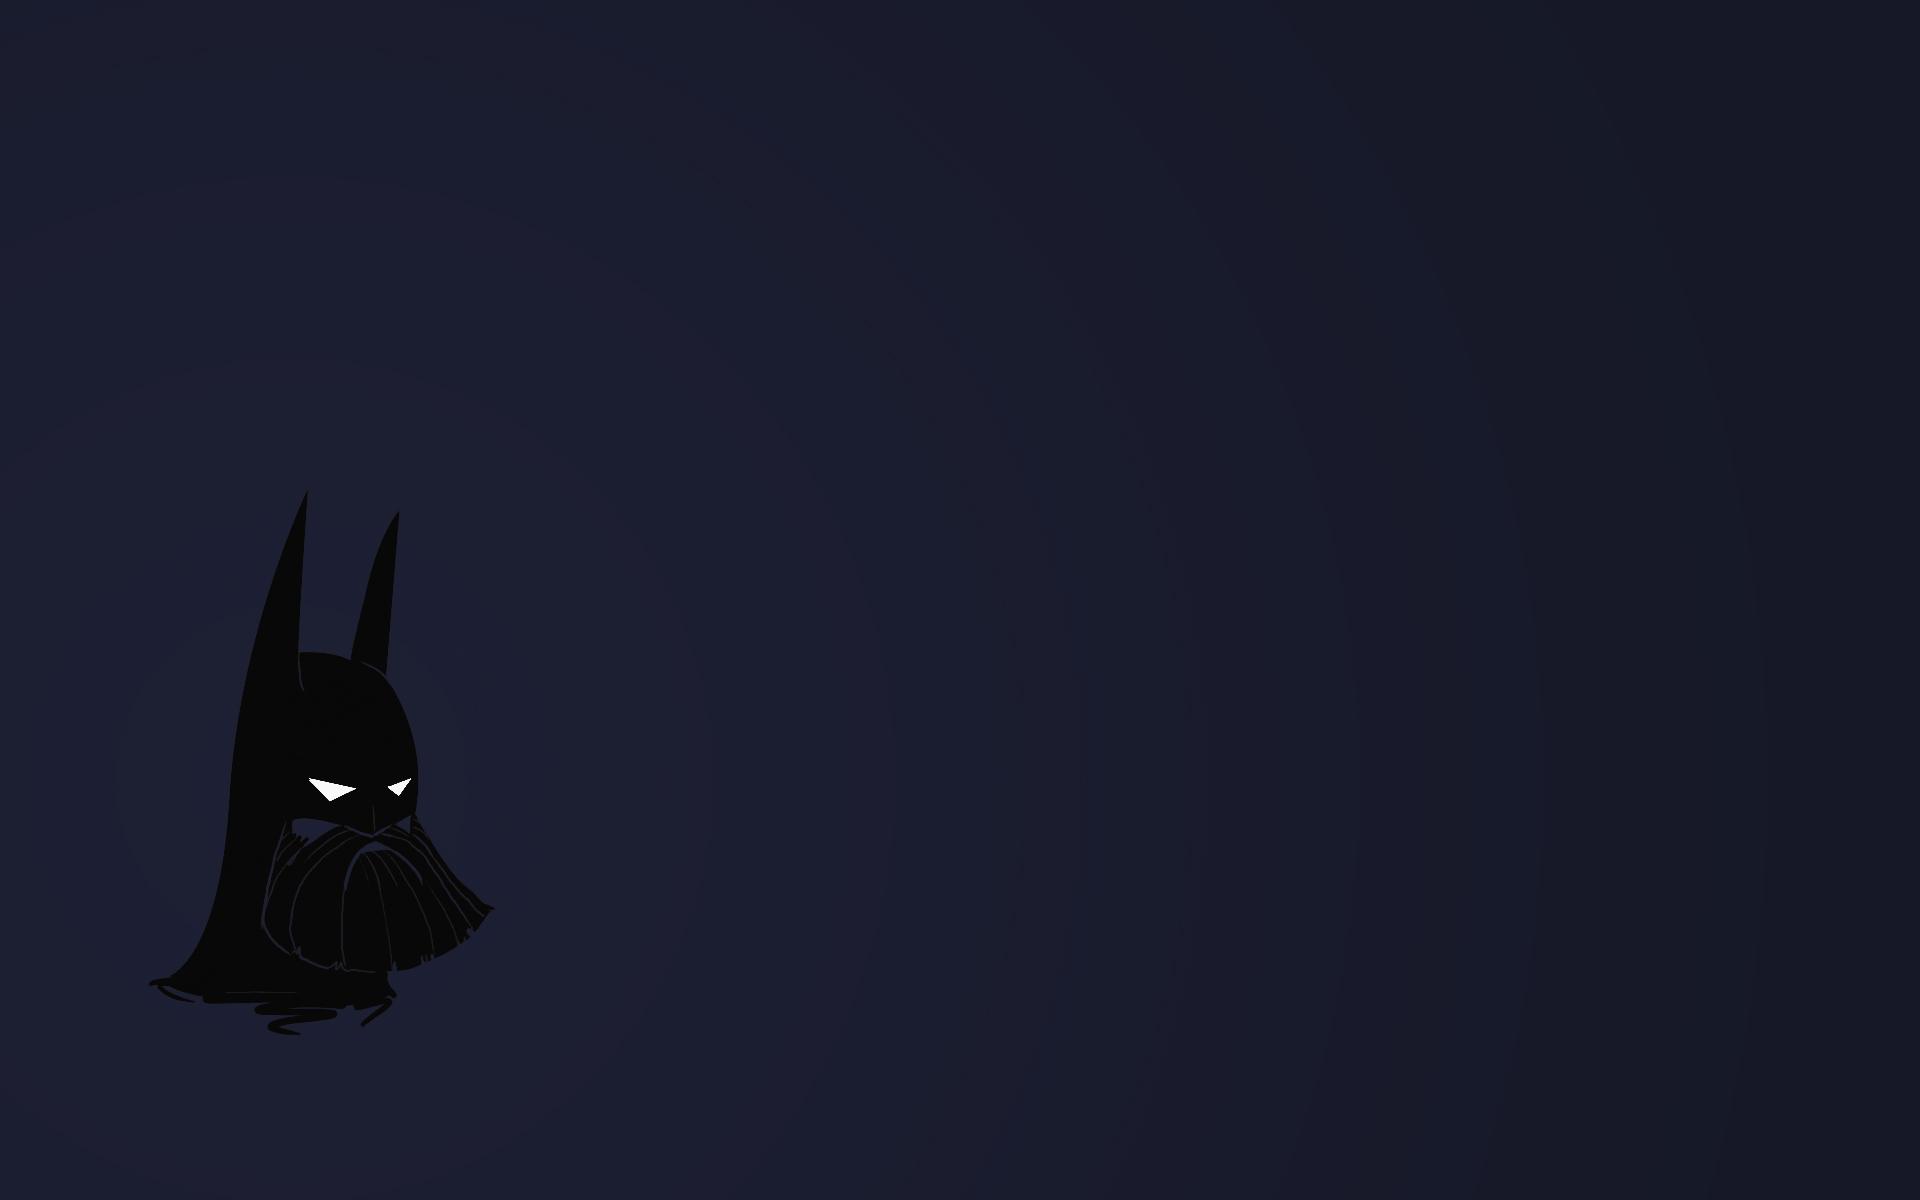 cute batman wallpaper - HD1920×1200